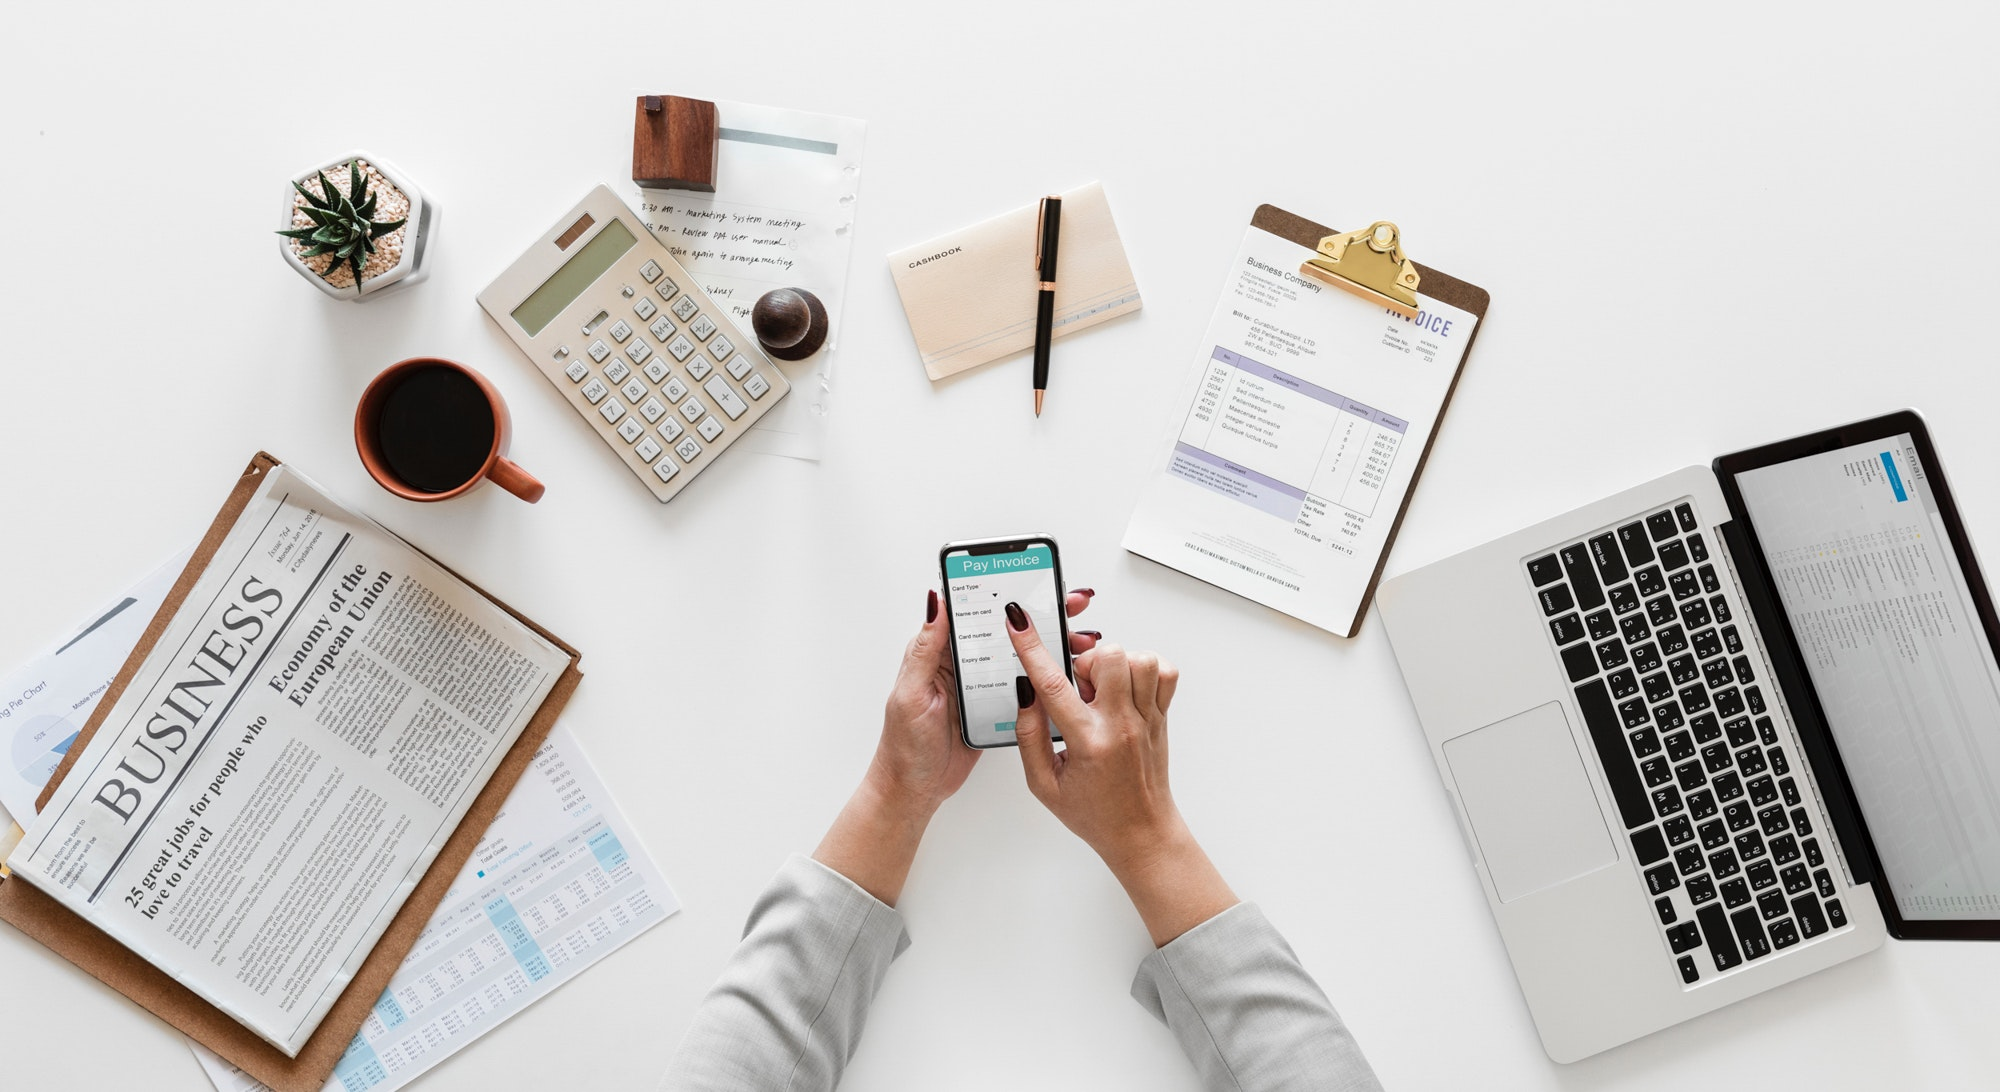 accounting-aerial-businesswoman-1043506.jpg